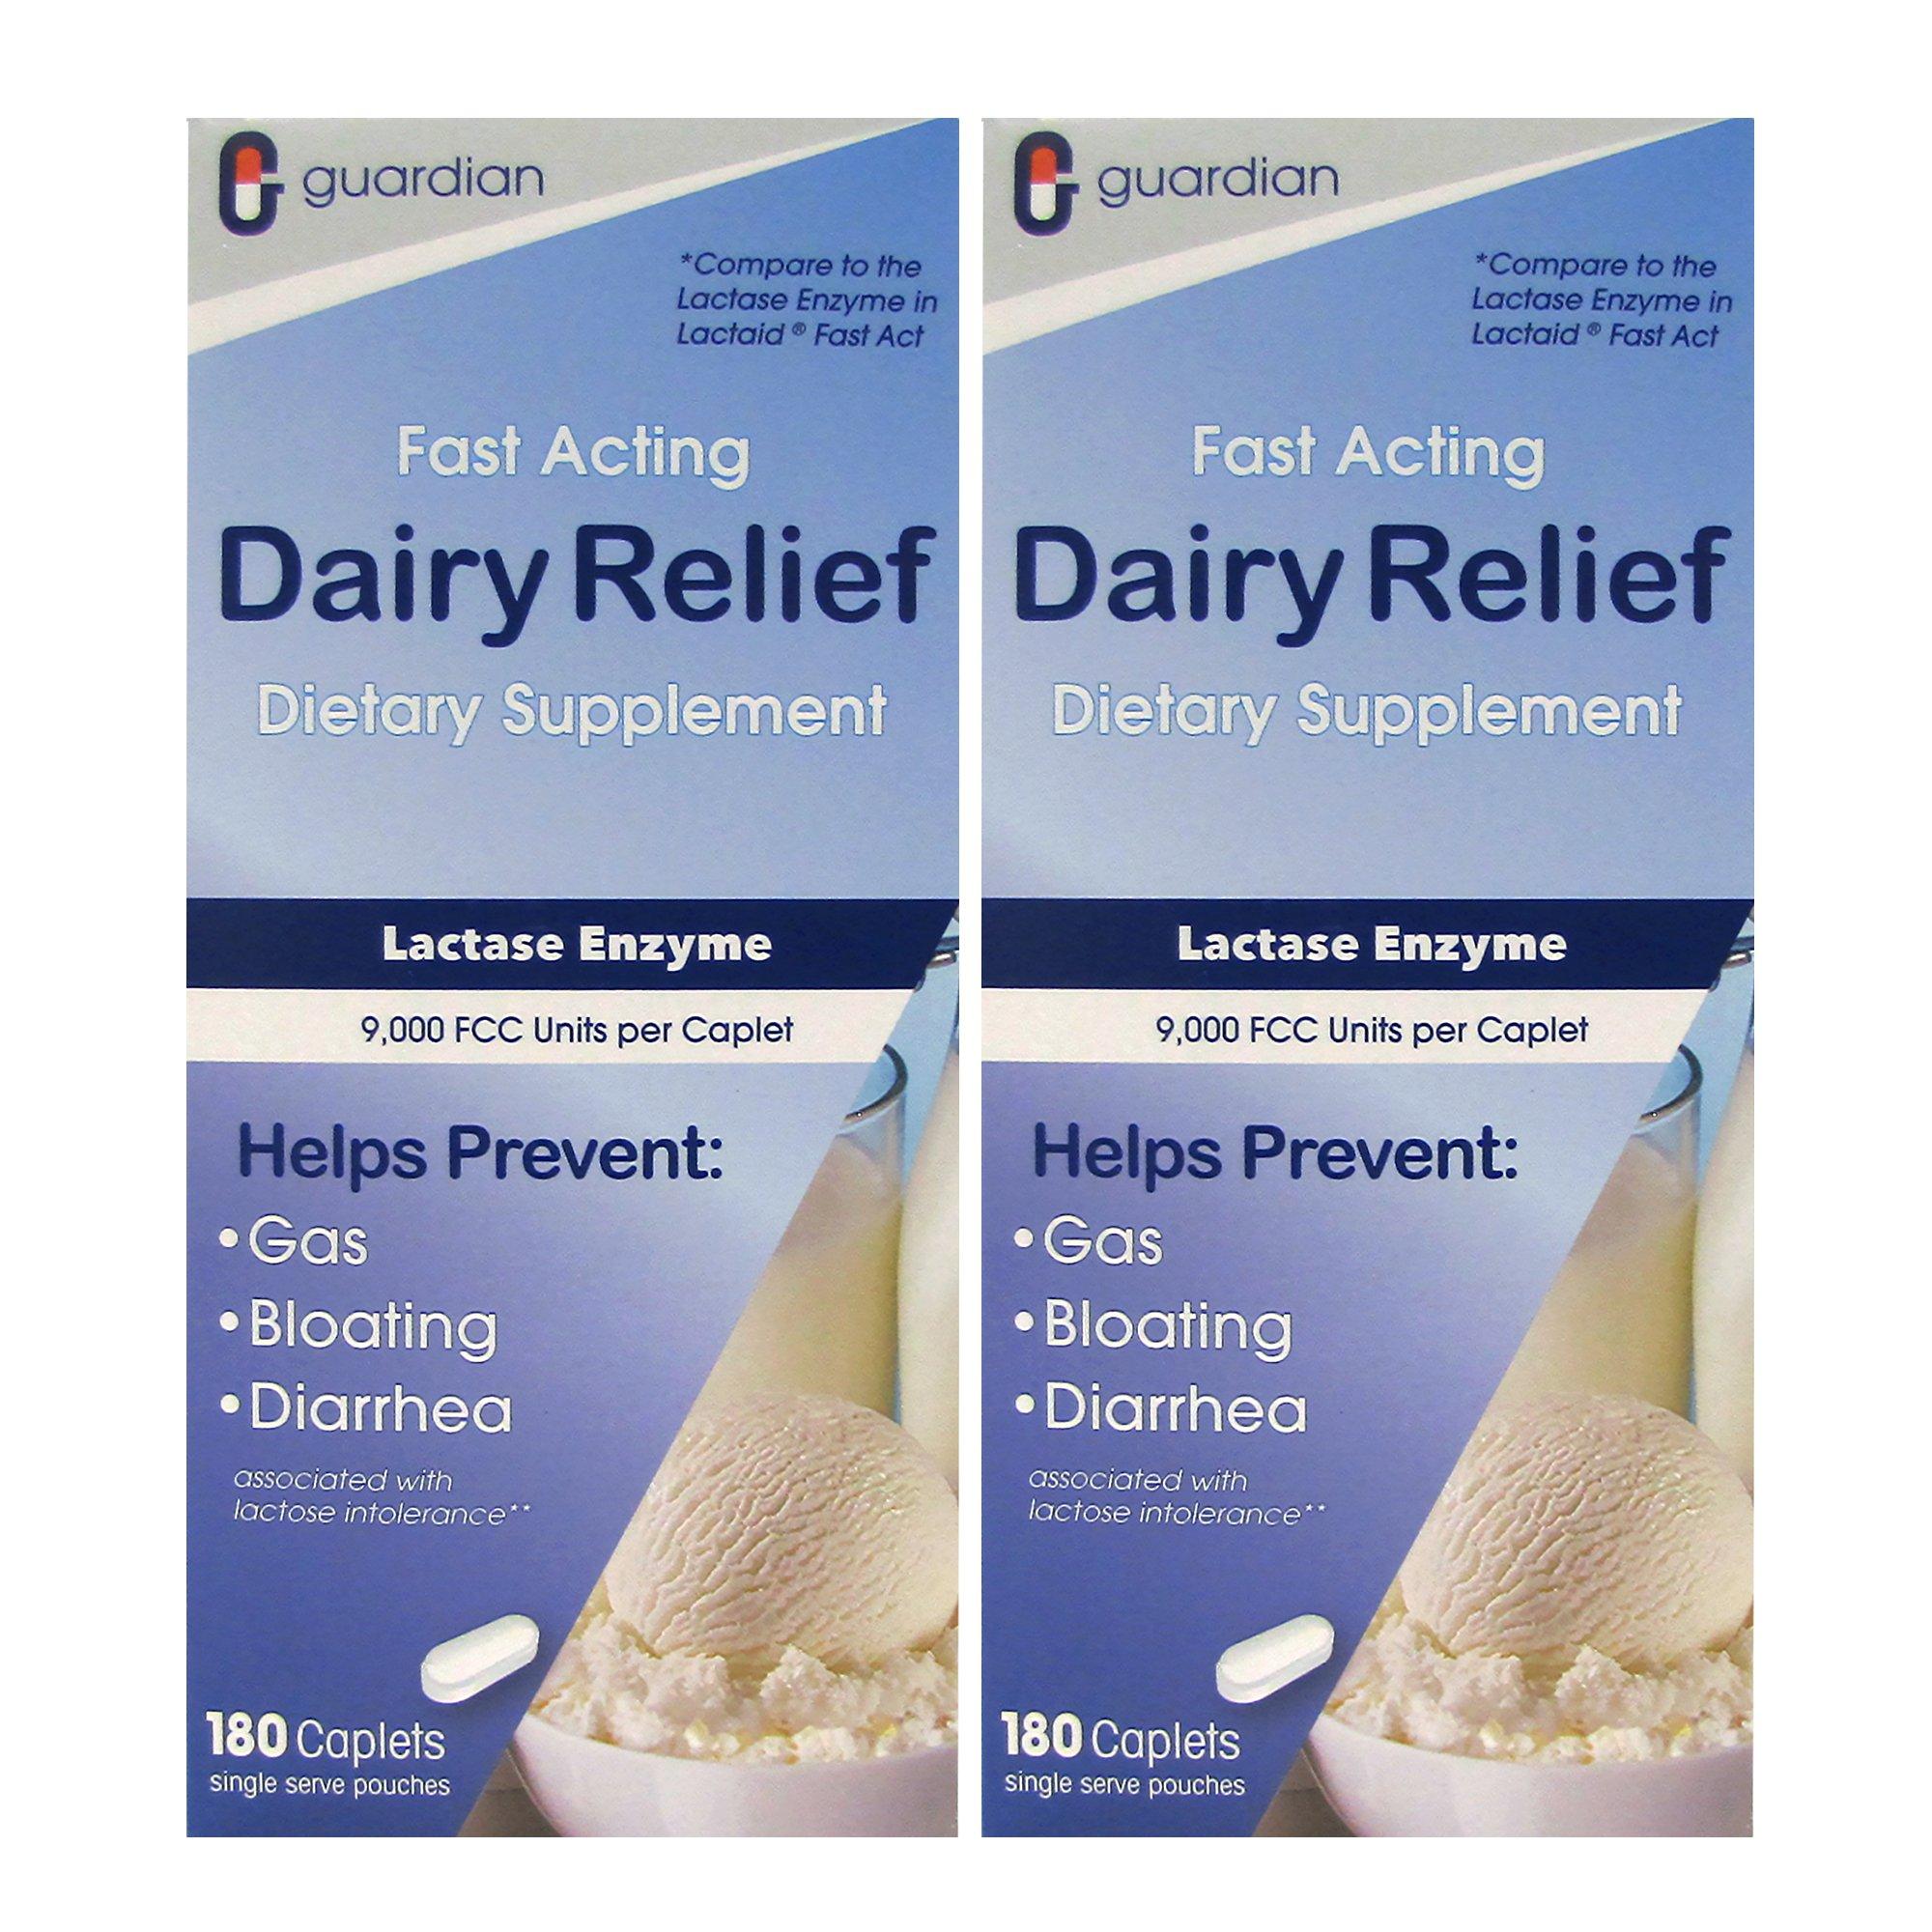 Guardian Dairy Relief Fast Acting Lactase, 360 Caplets, 9000 FCC Maximum Strength, Lactose Intolerance Pills, Lactase Enzyme Supplement (360 CT) by Guardian